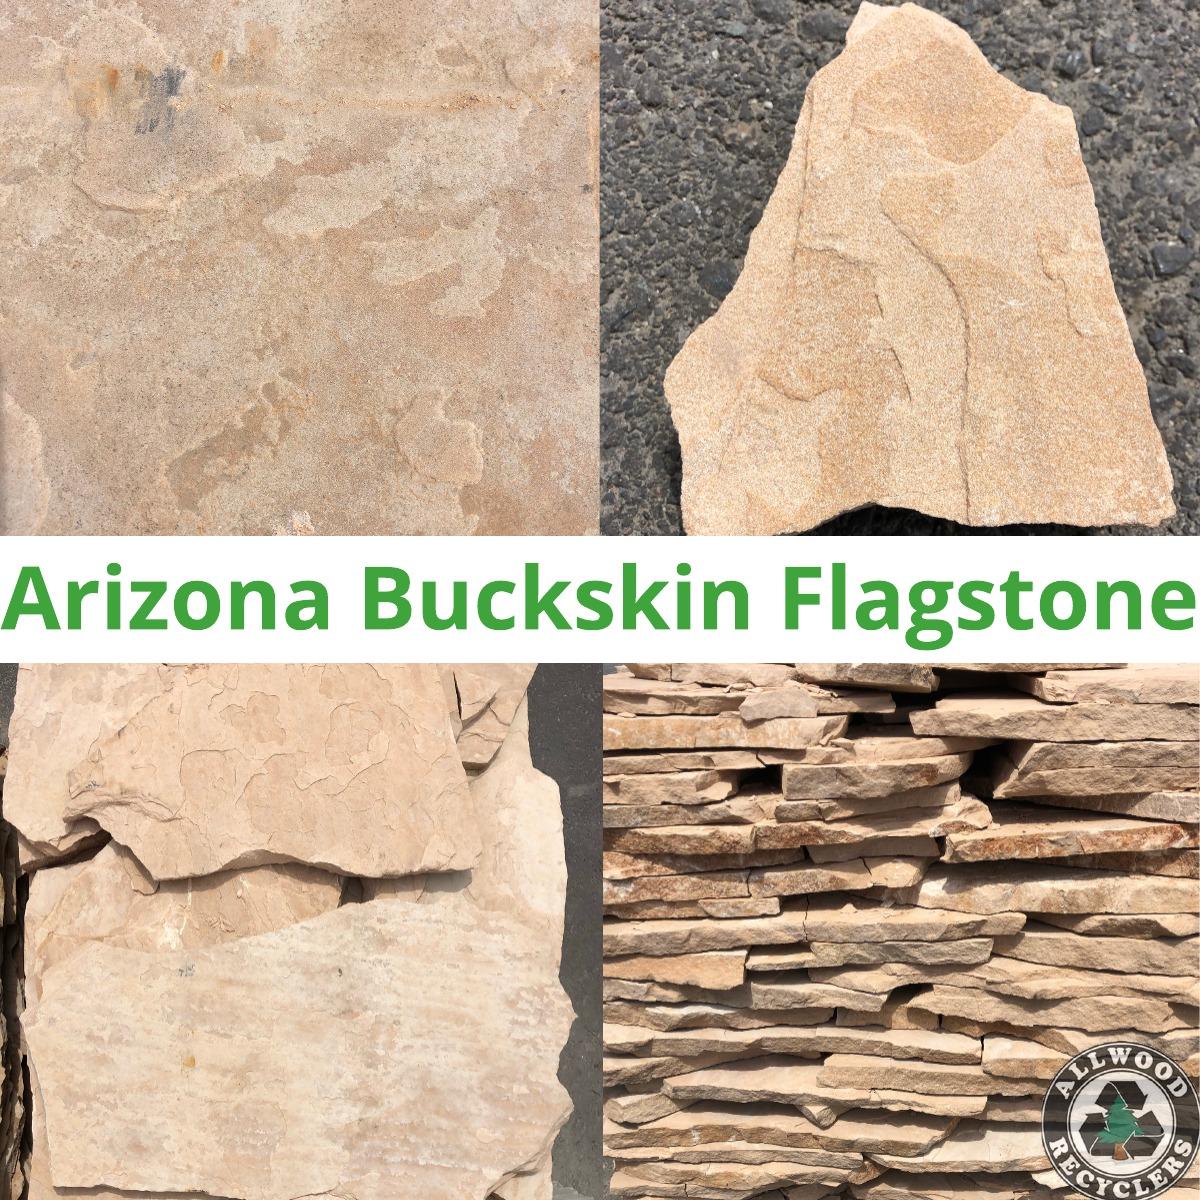 Arizona Buckskin Flagstone